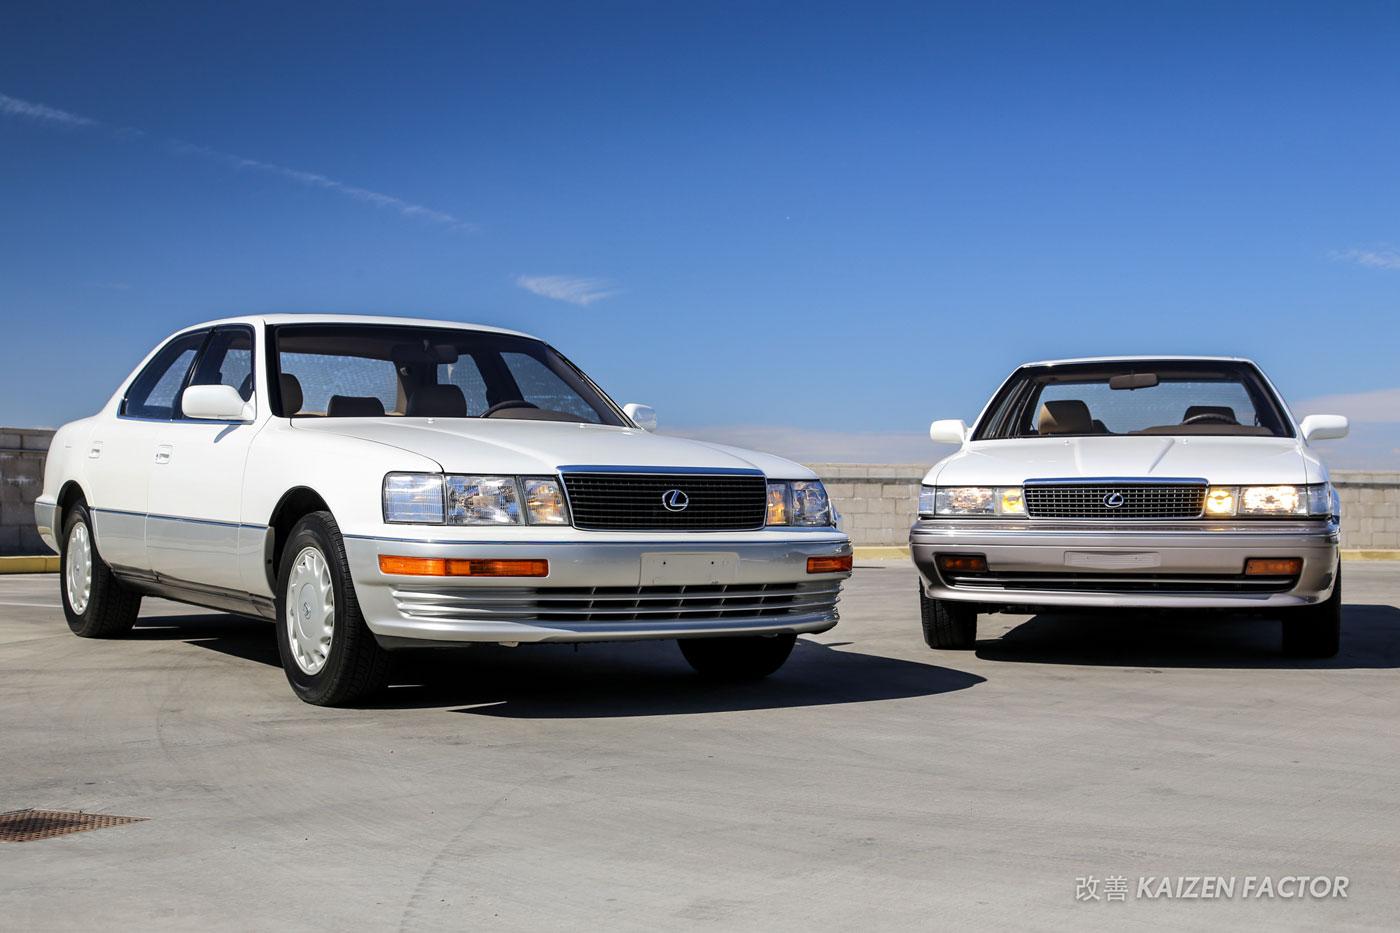 Photo: Lexus LS 400 & ES 250 Together Again | Lexus Enthusiast